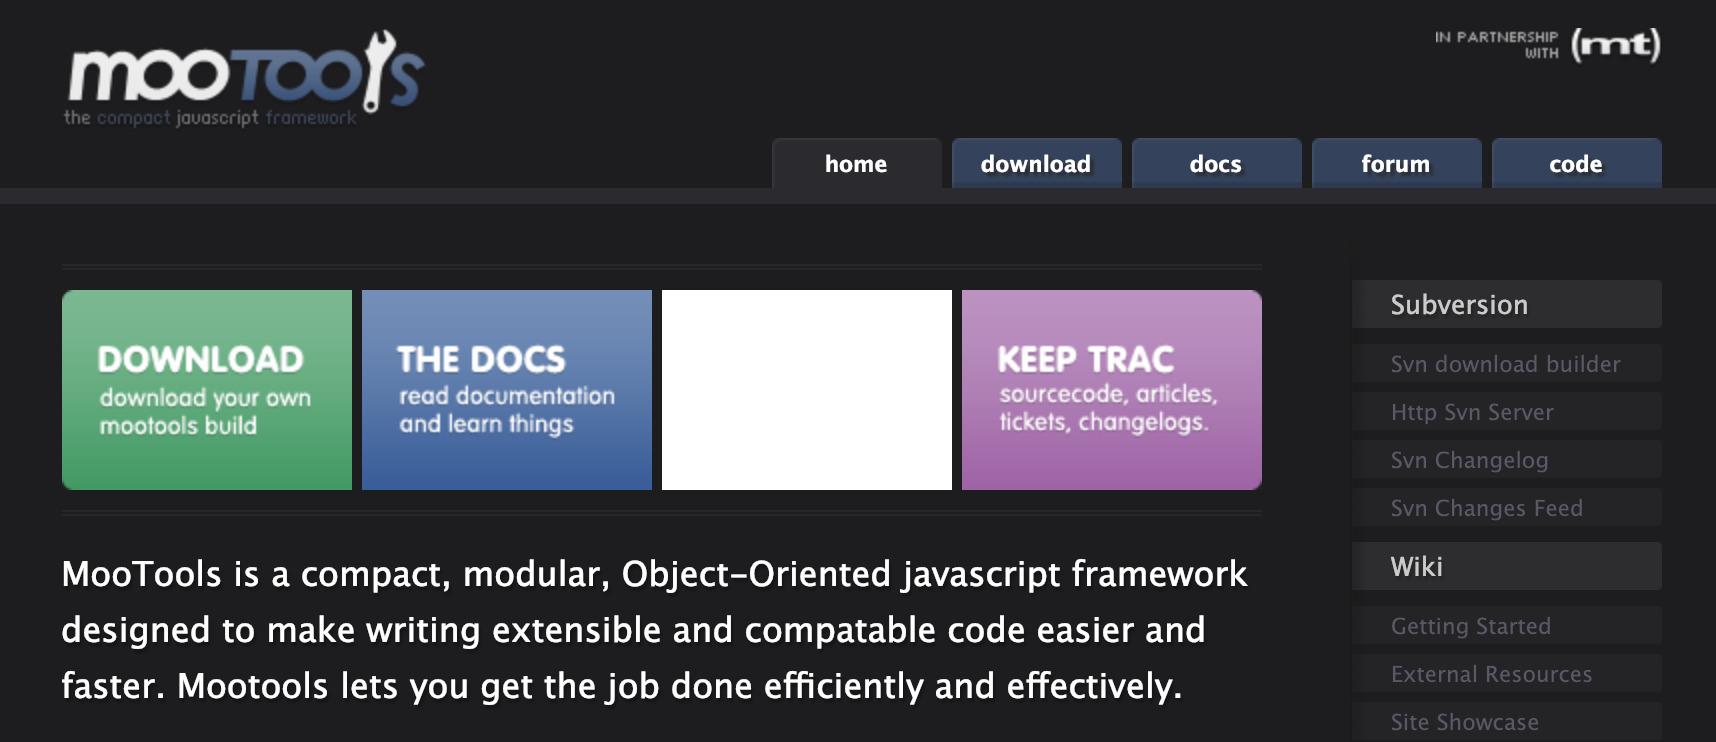 Screenshot of the MooTools website in 2007